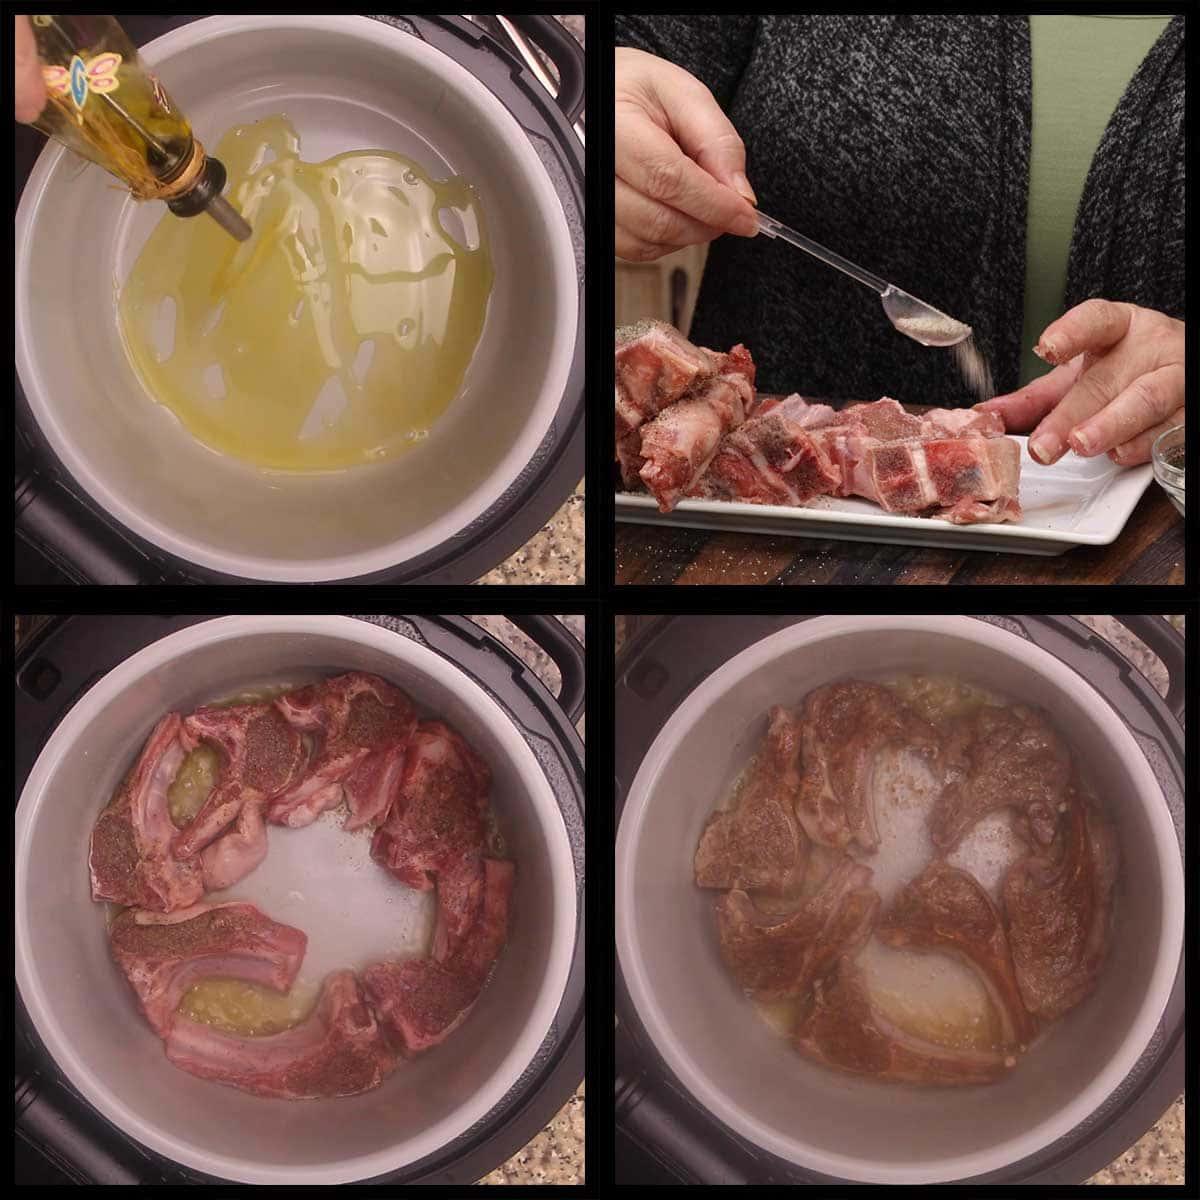 searing lamb in the inner pot of the ninja foodi